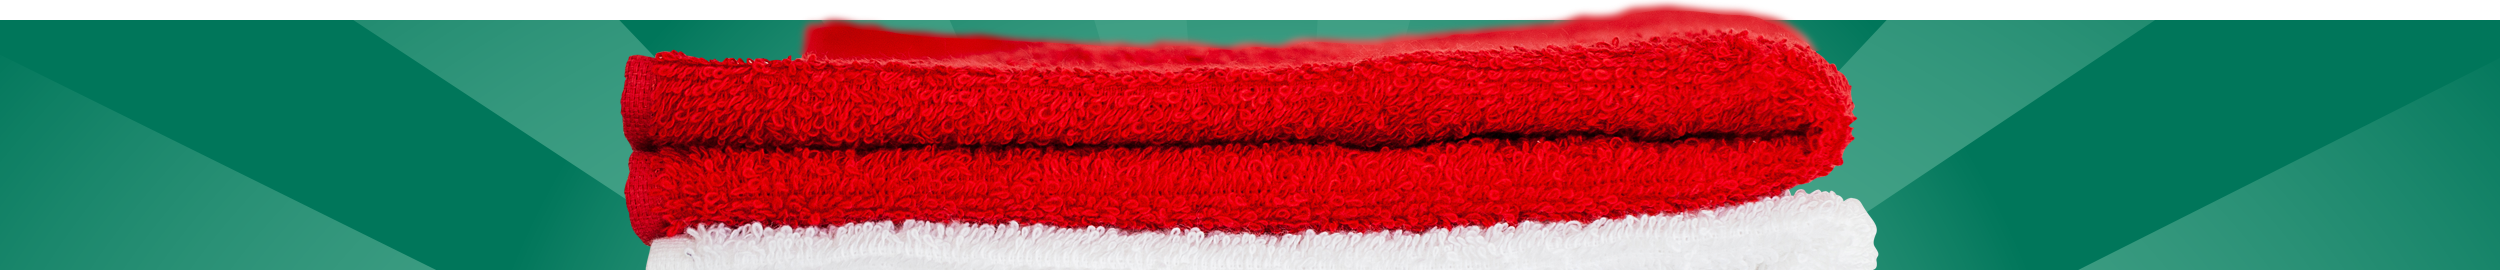 Towels Header | Minuteman Press Norwich